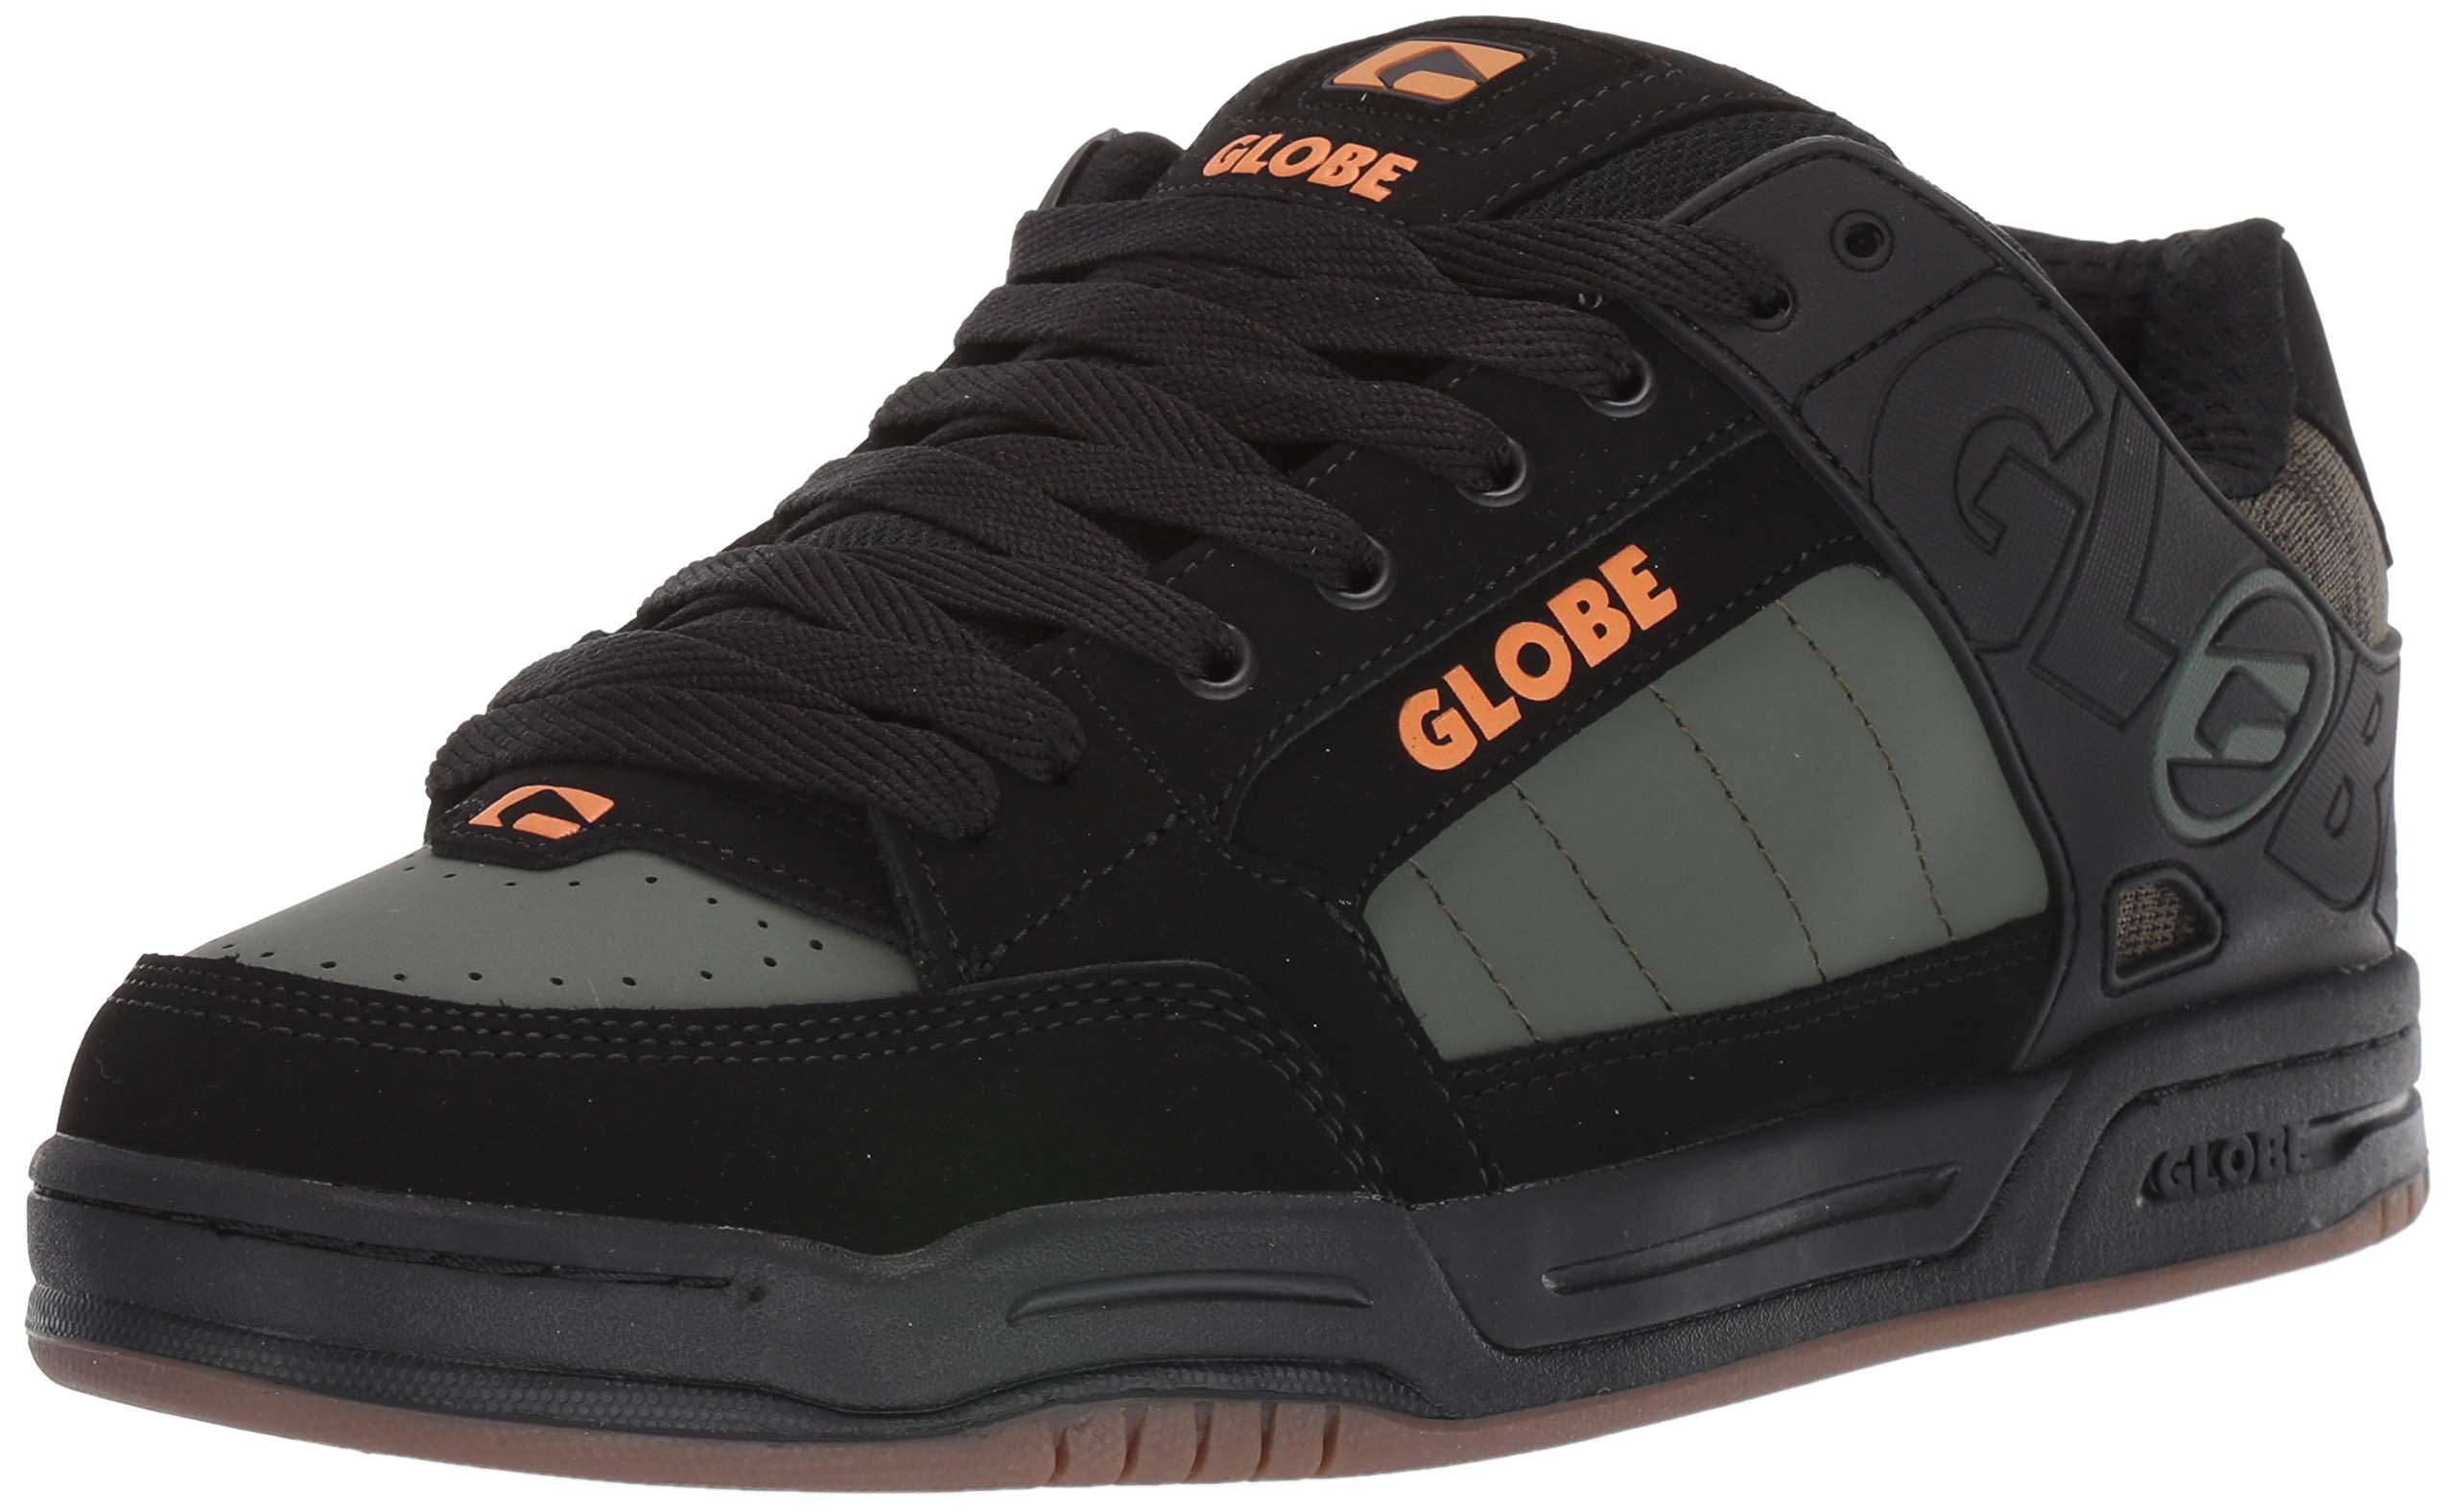 Globe Men's Tilt Skate Shoe, Black/Olive Knit, 7.5 Medium US by Globe